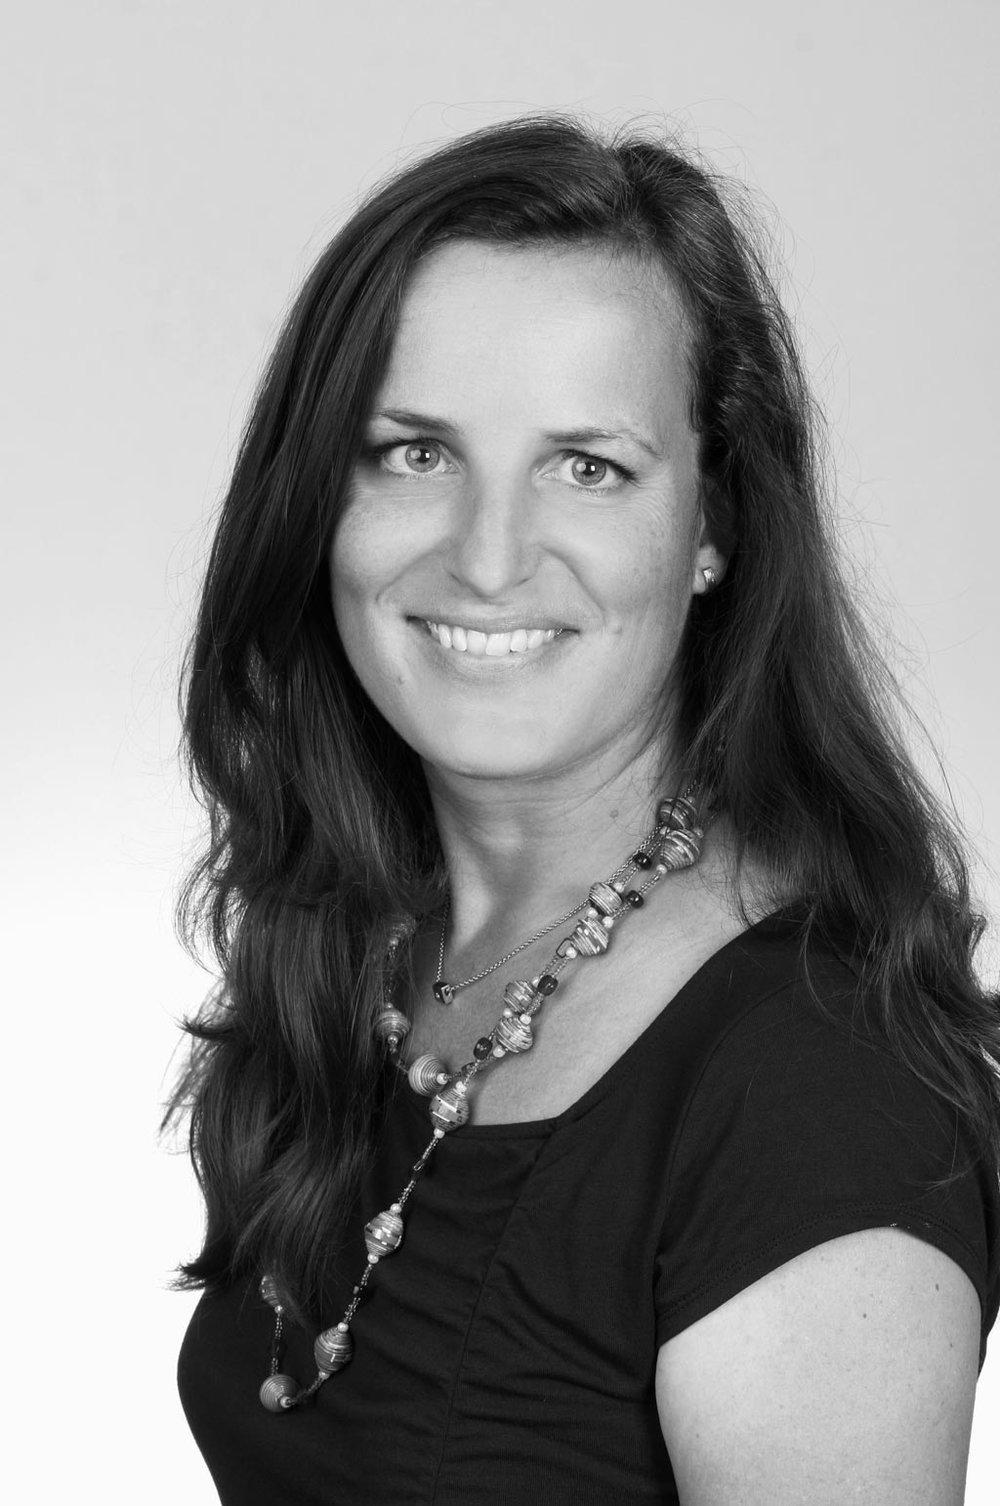 Alexandra-van-der-Ploeg-SAP-2.jpg